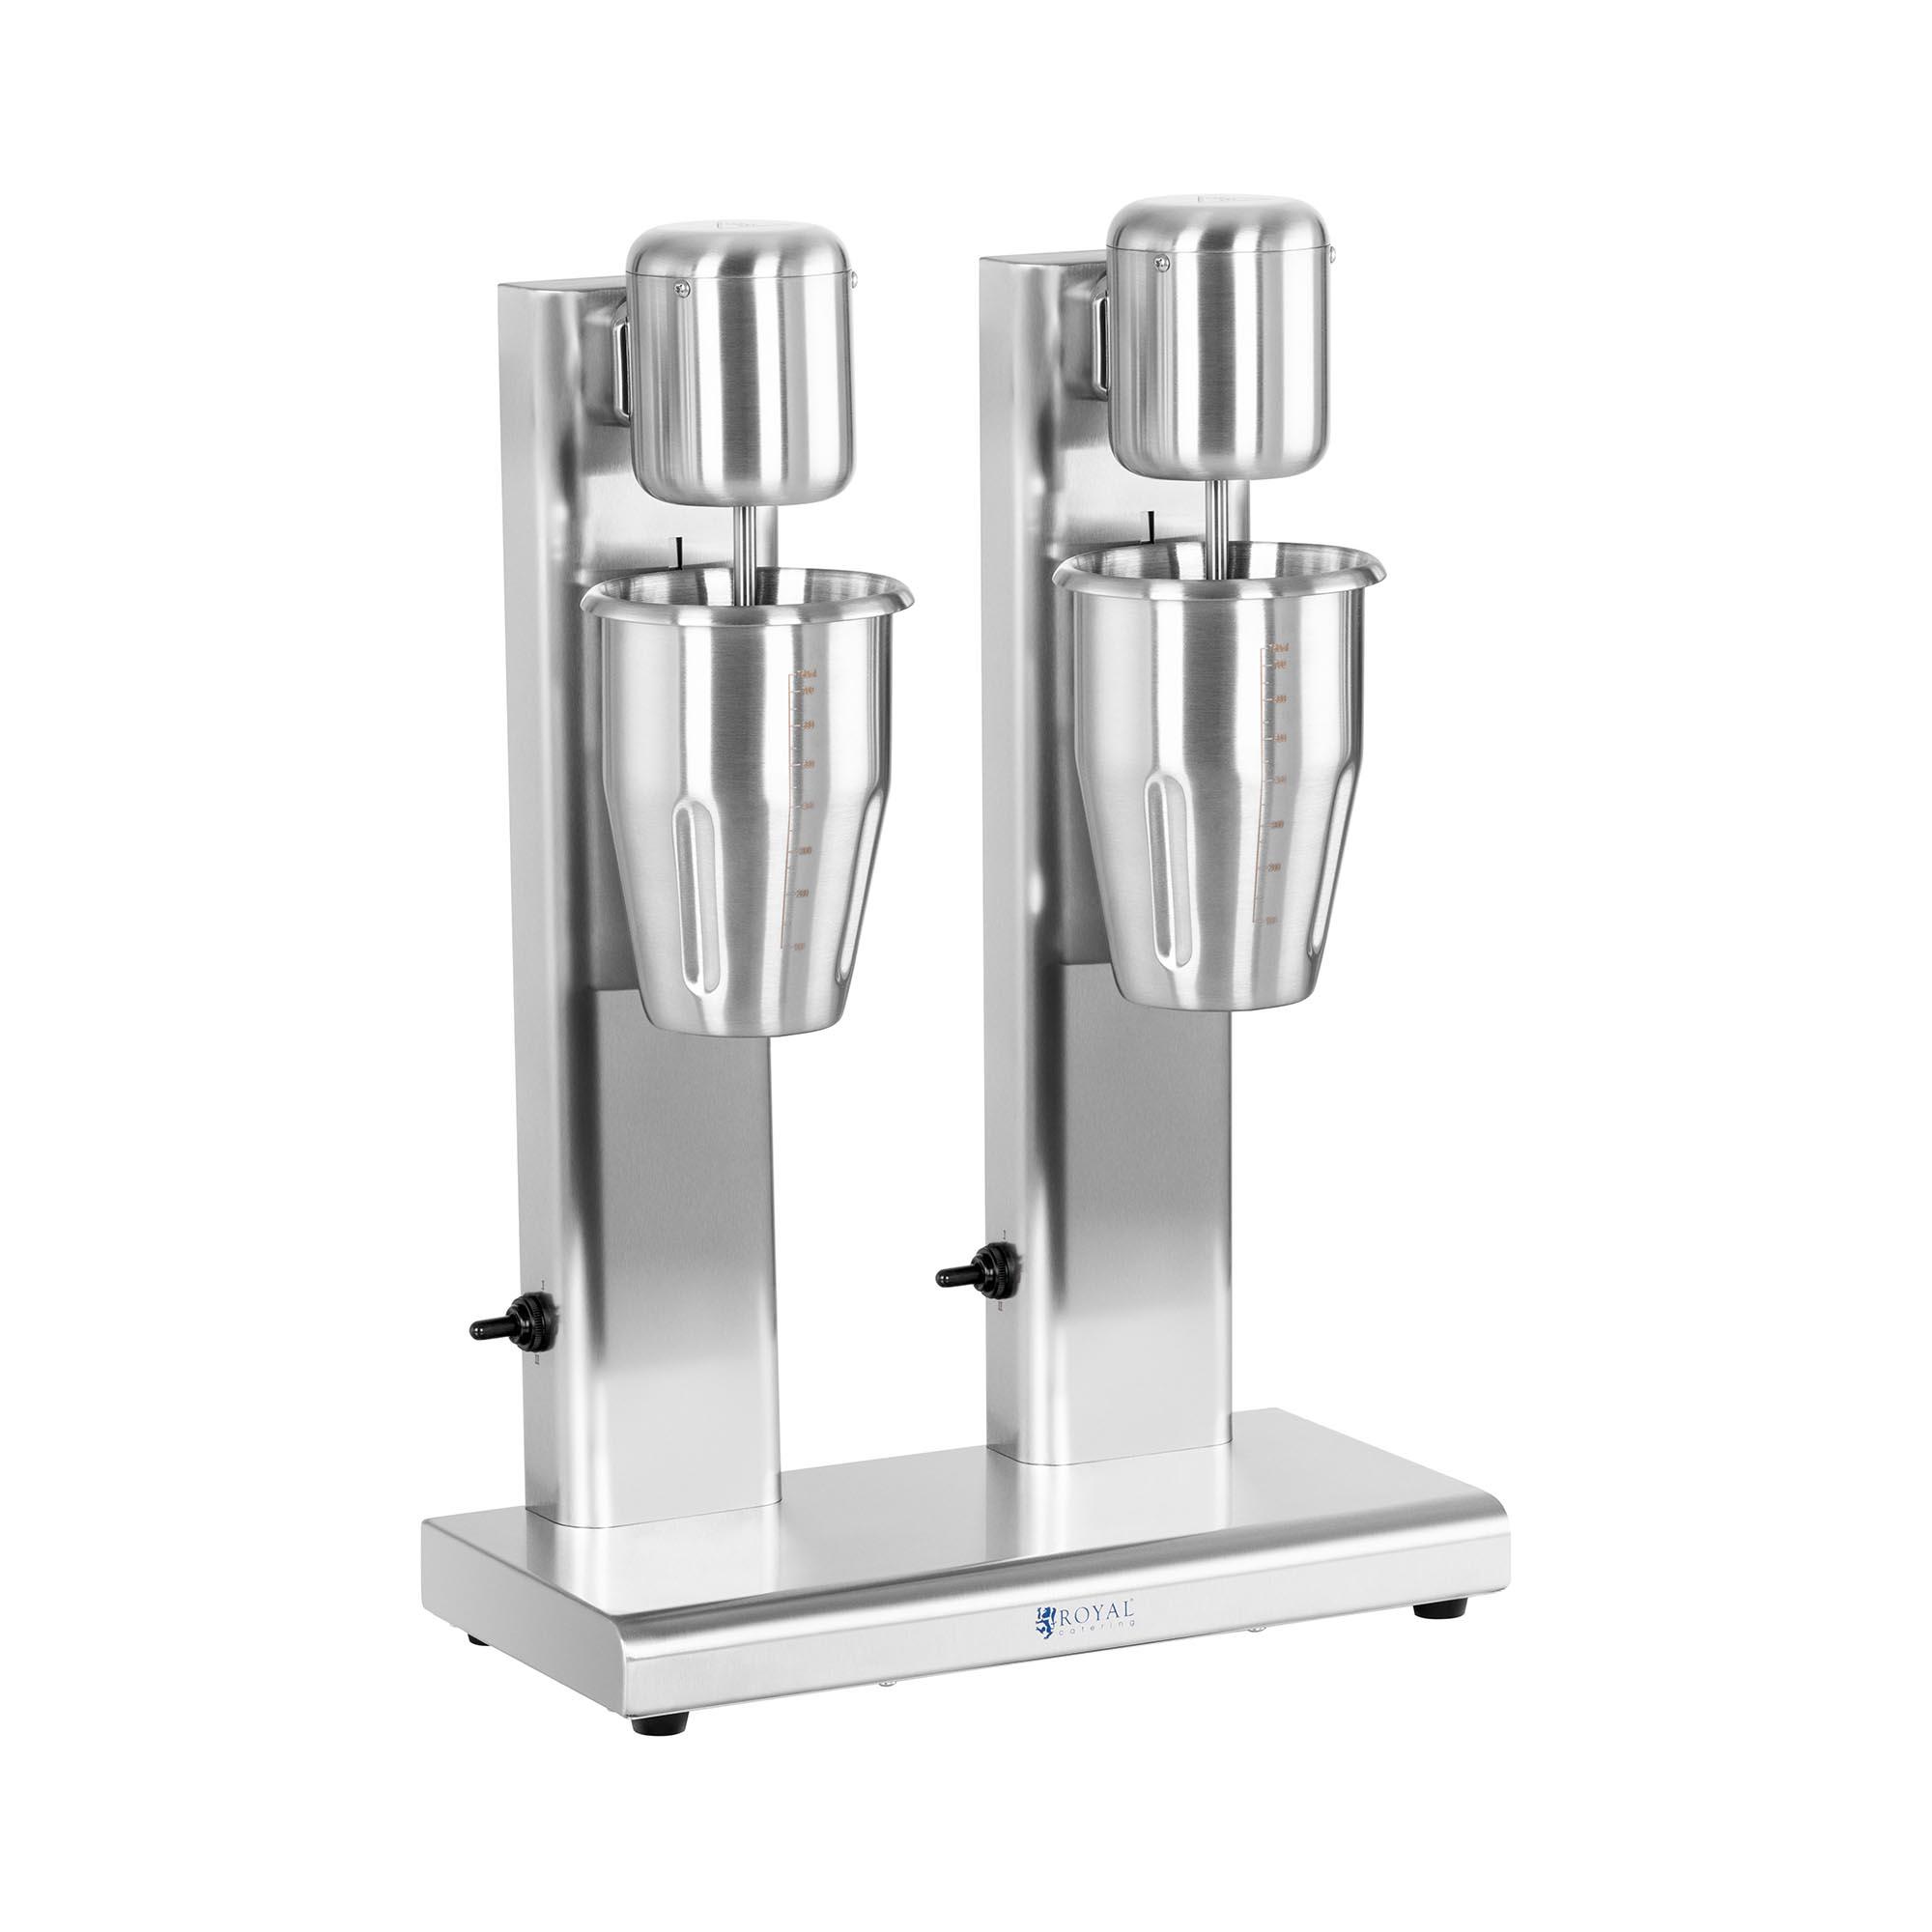 Royal Catering Milchshaker - doppelt - 2 x 1 L - 15.000 U/min - Edelstahl RCPMS-160S